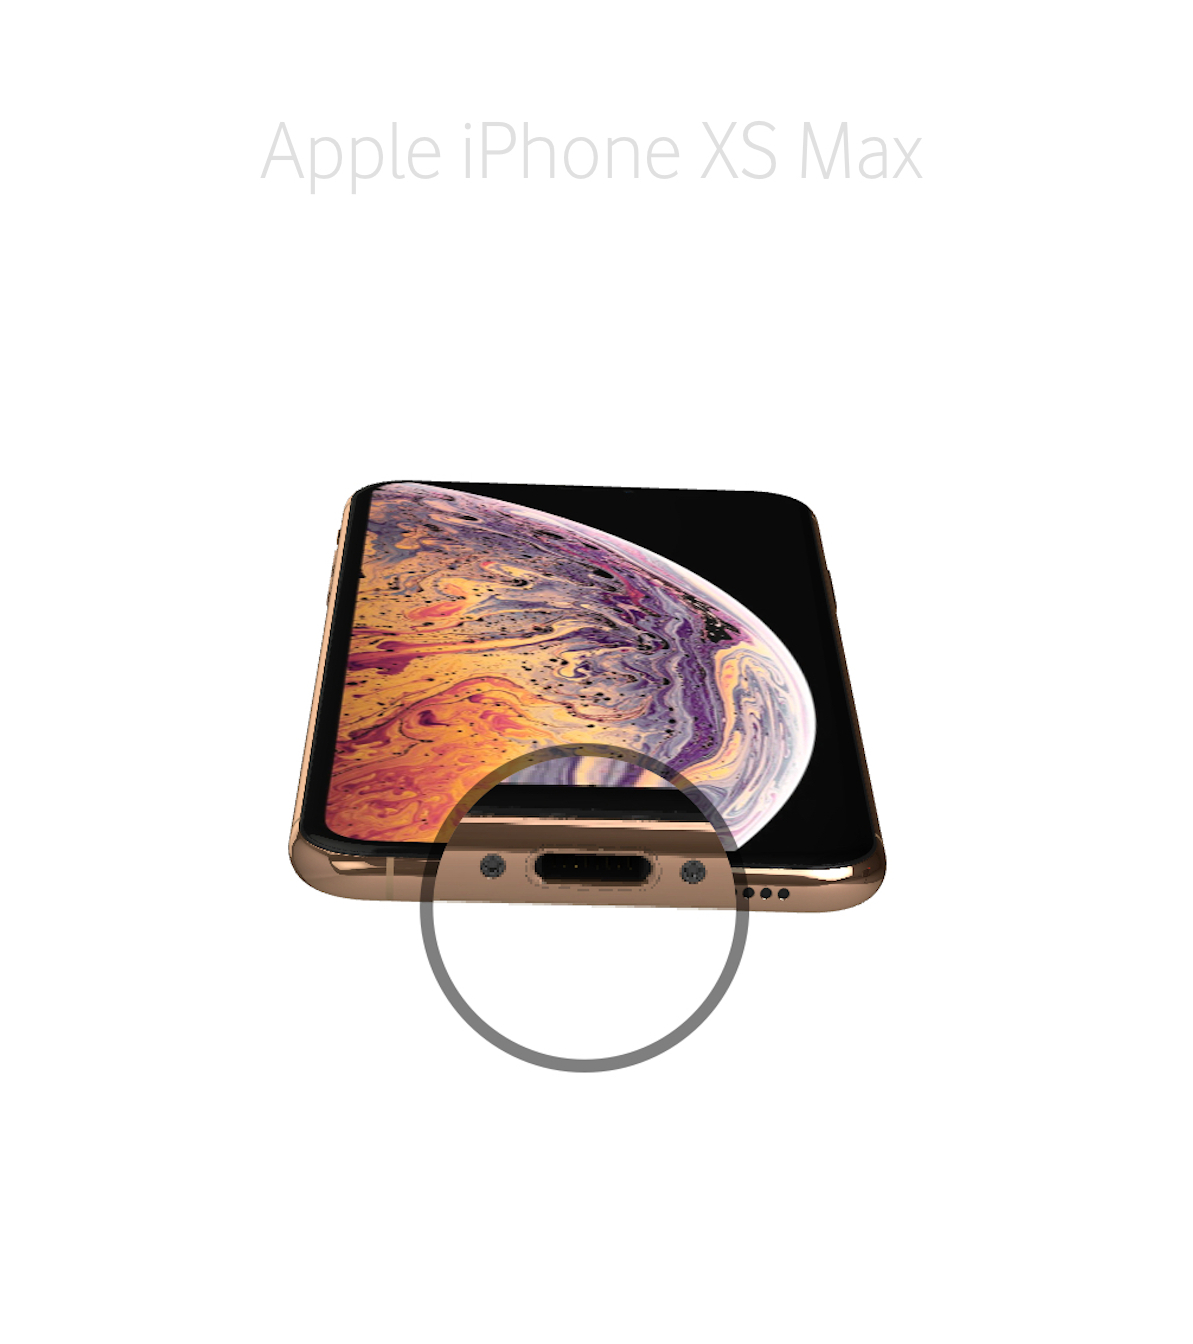 Laga audiokontakt iPhone Xs Max